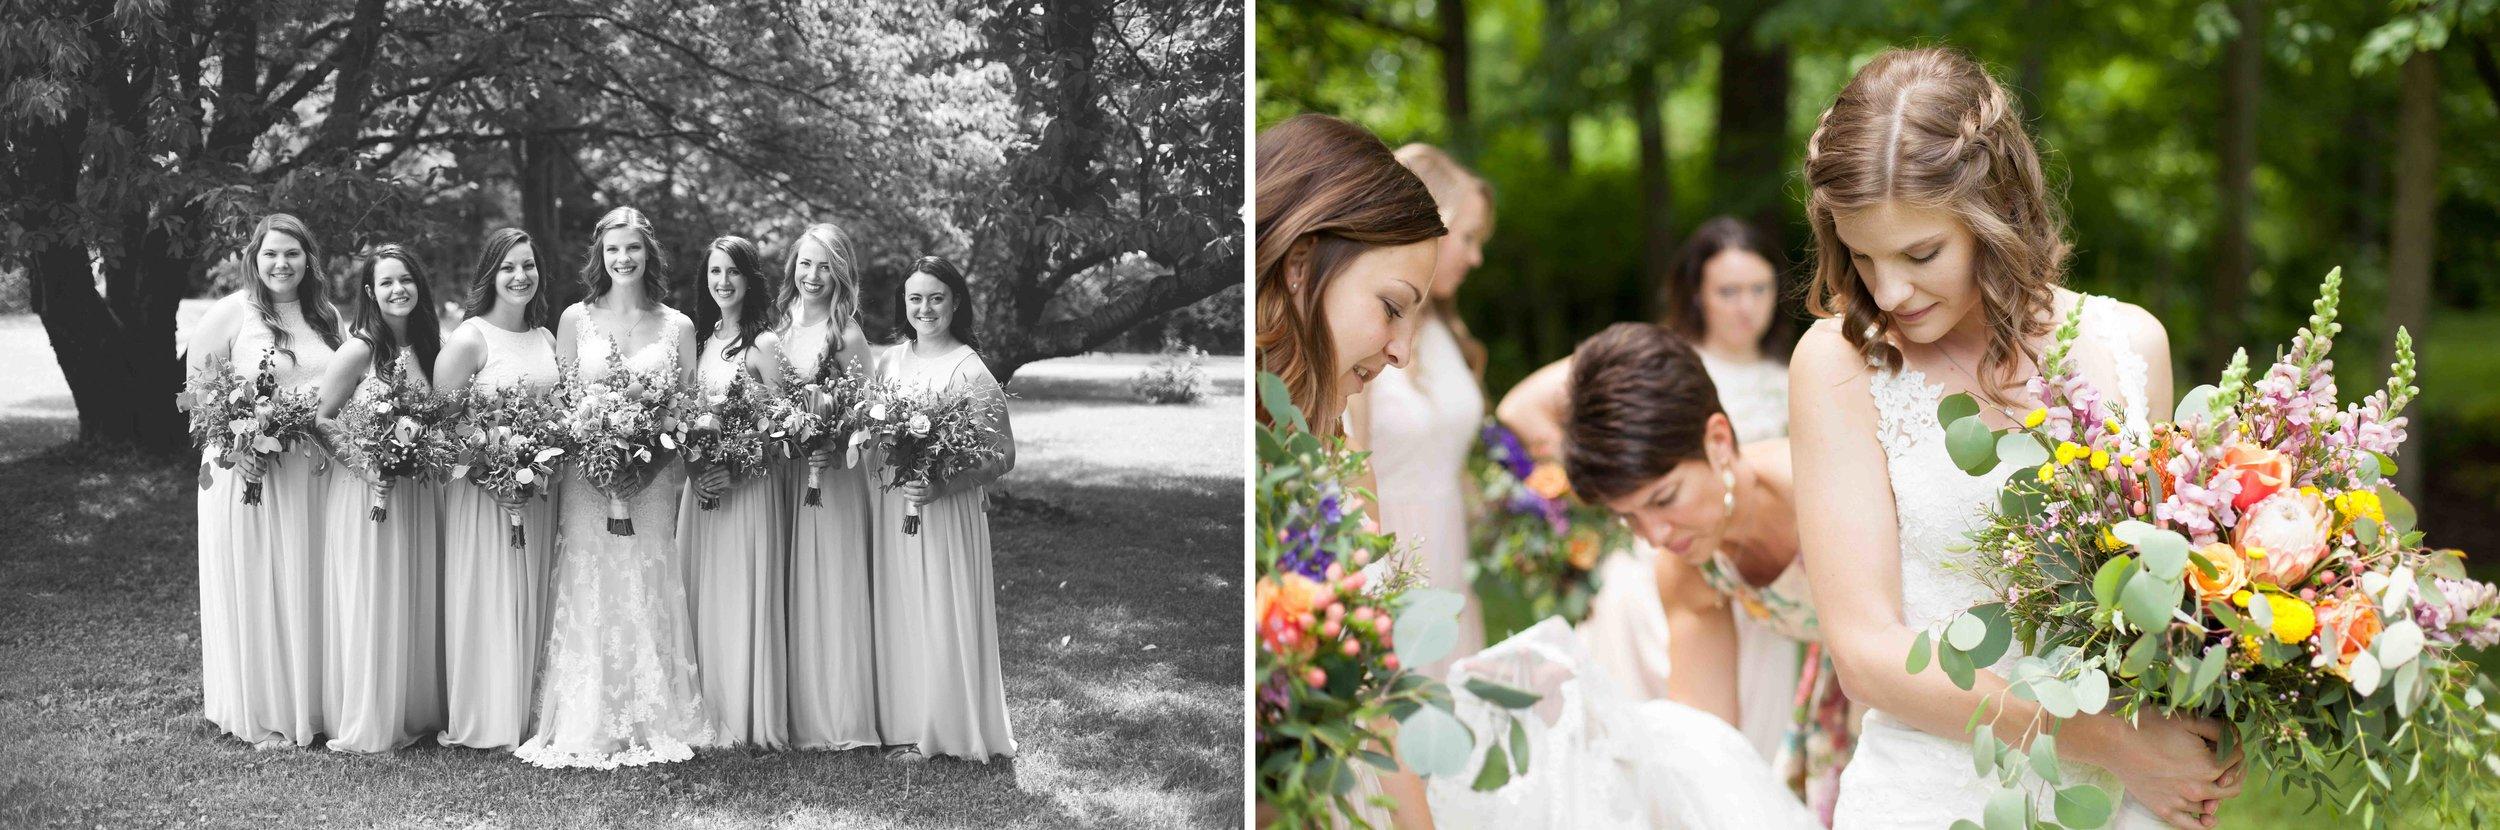 bb cincinnati wedding photographer girls0001.jpg